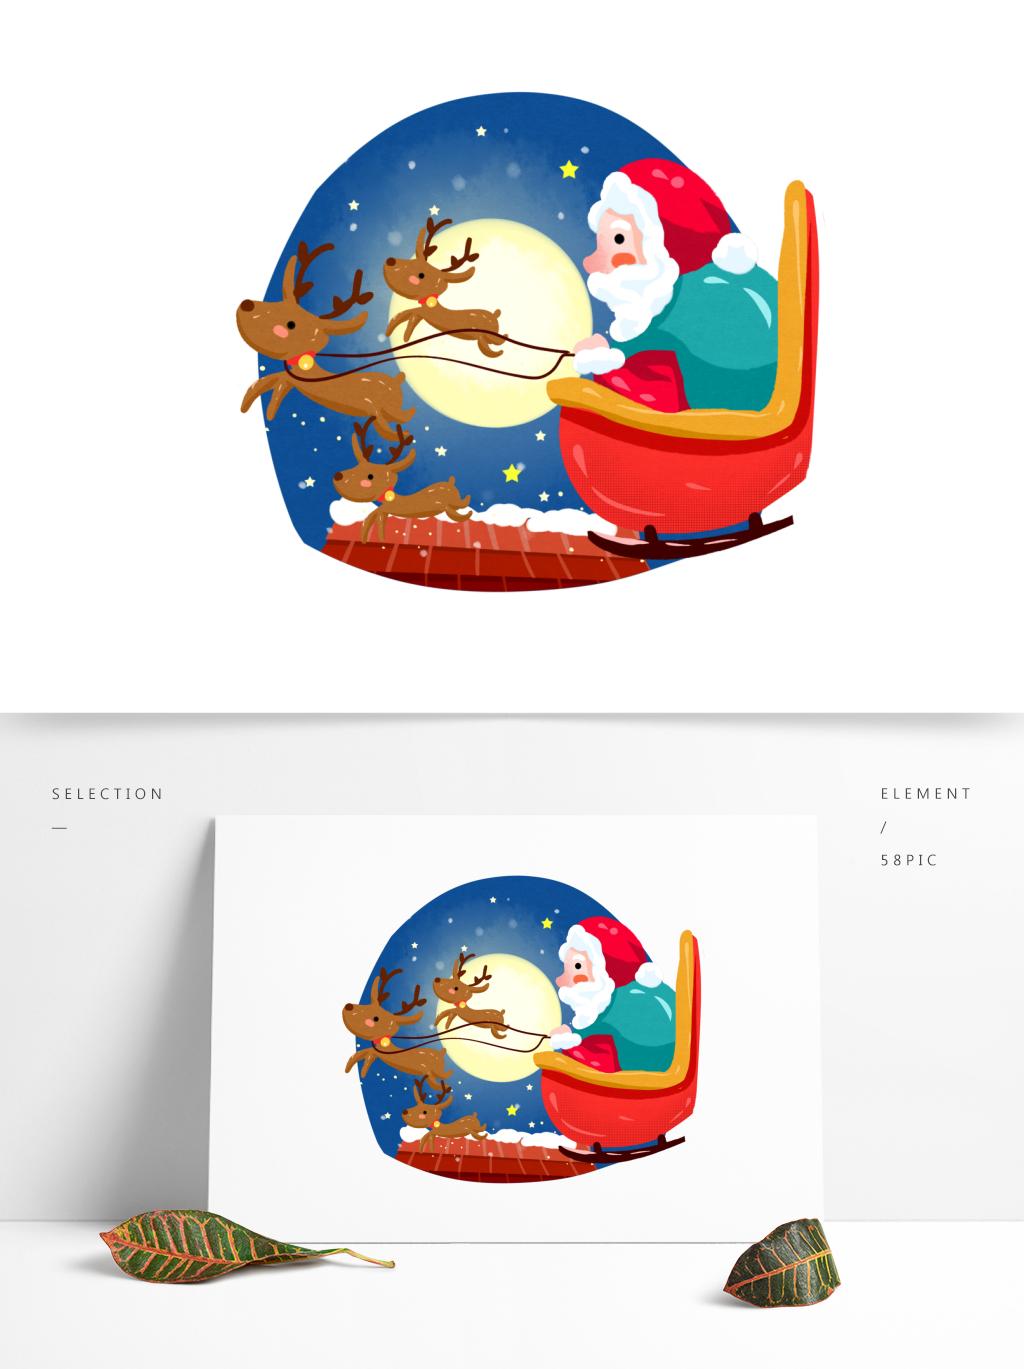 1024x1369 christmas scene santa claus giving gifts night sky elk image